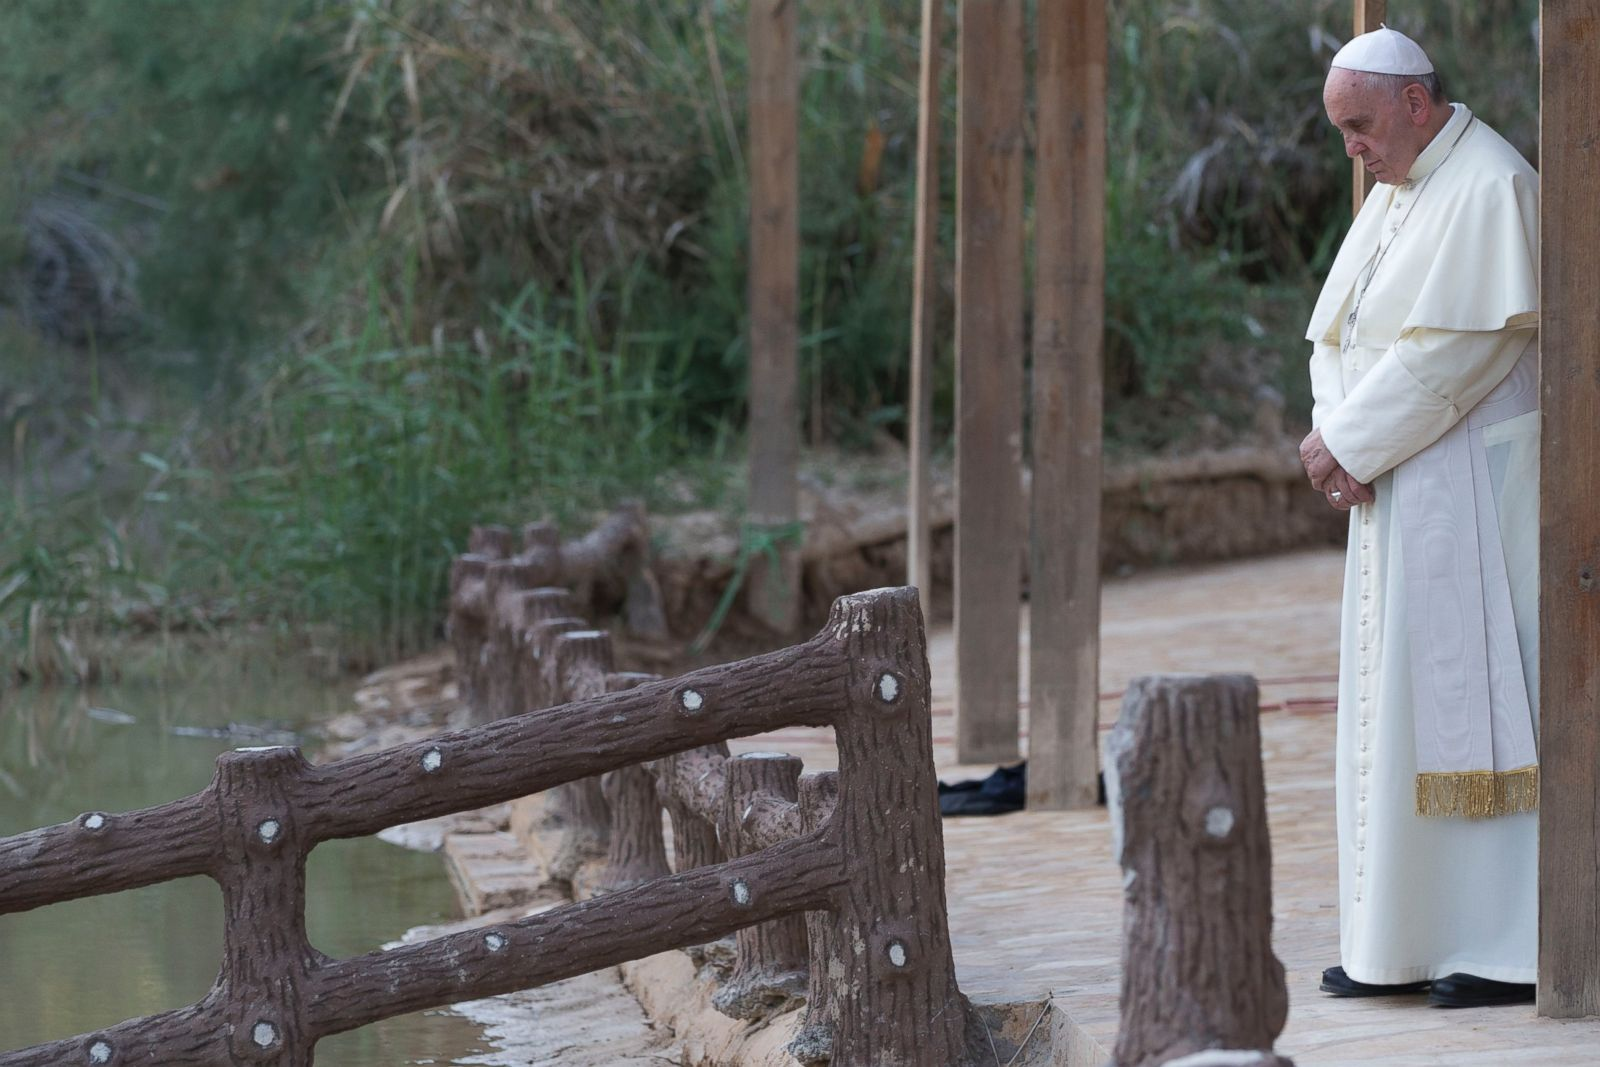 Pope Francis at the Jordan River, ABC News